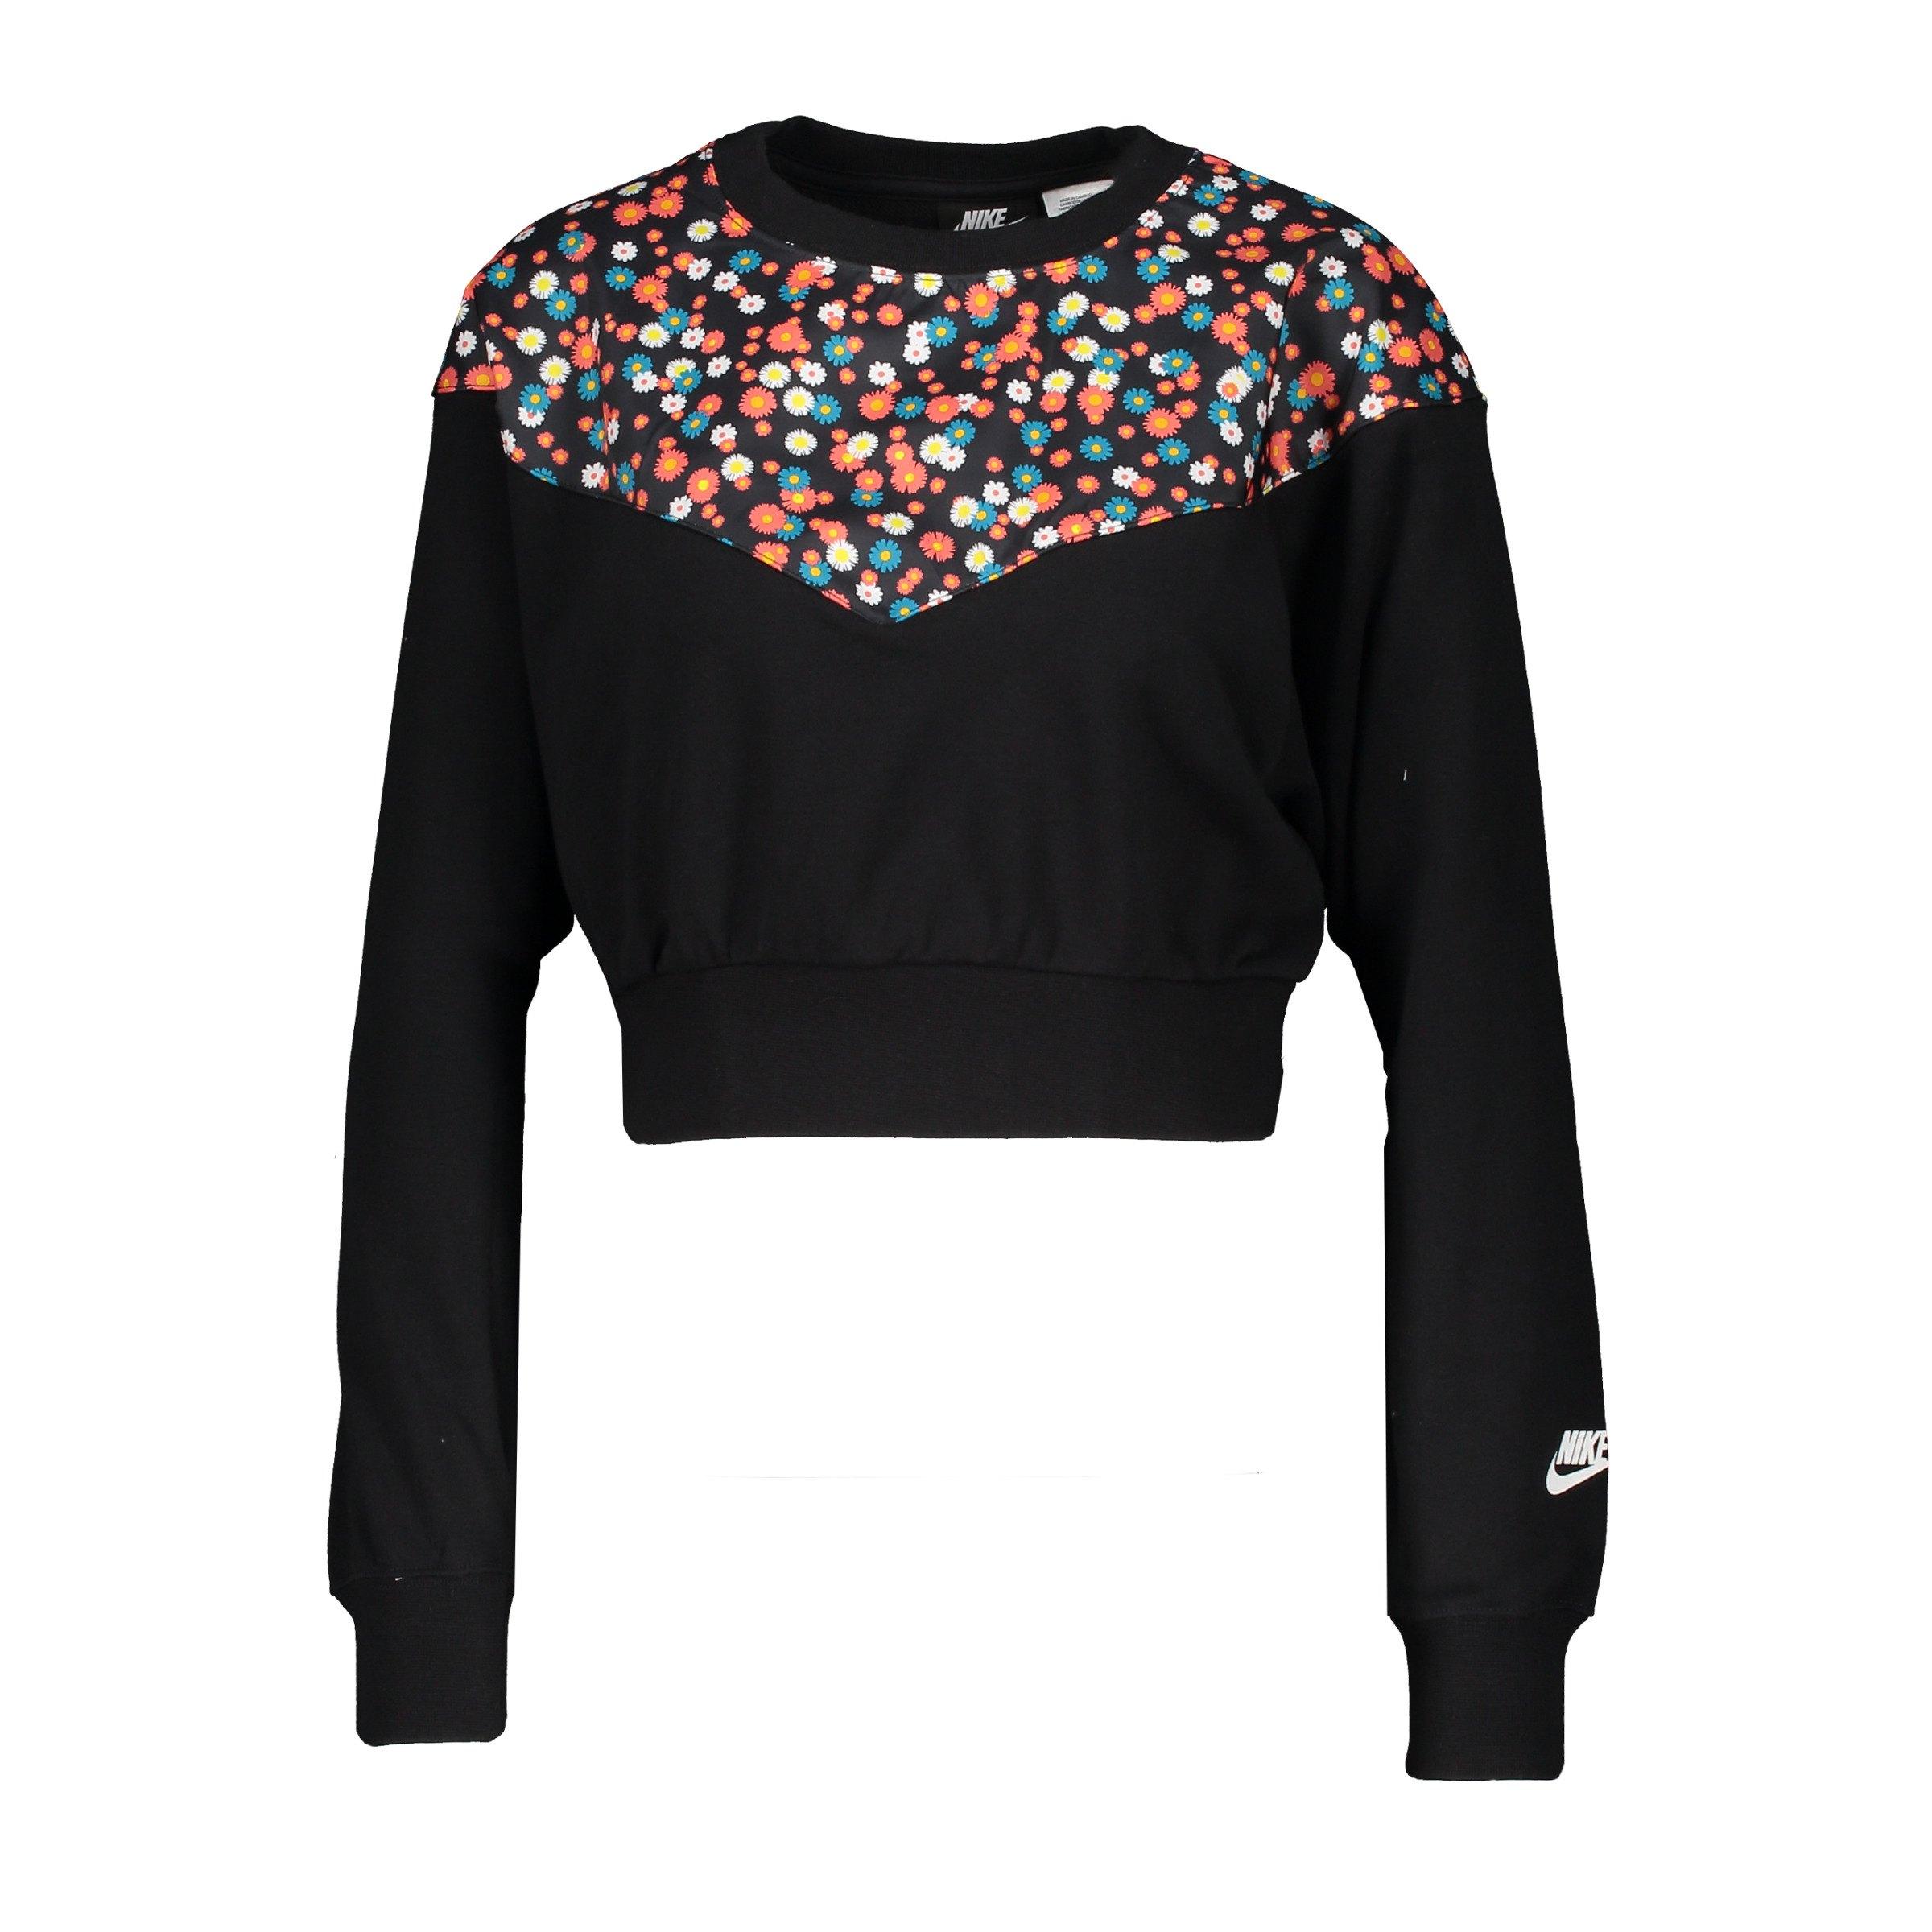 nike heritage floral sweatshirt damen schwarz f010